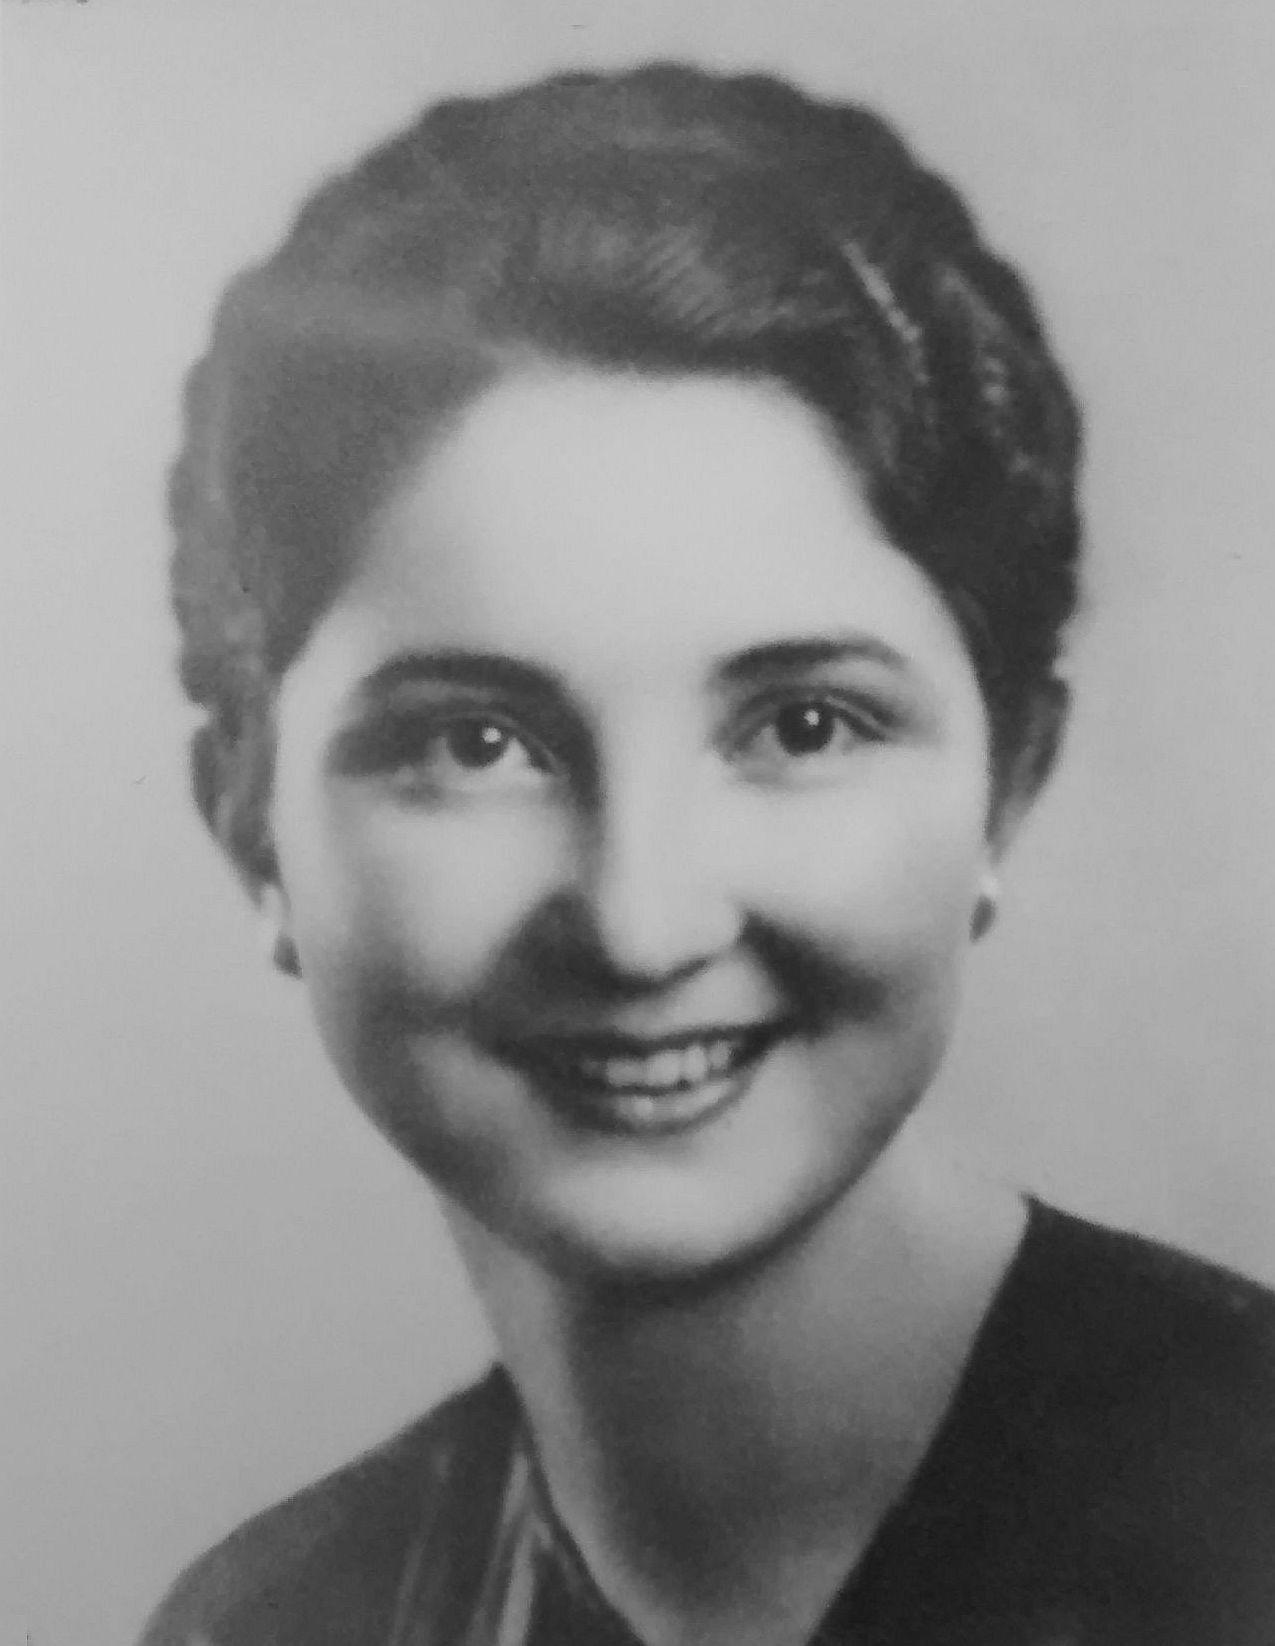 Reymann, Louise Helmken